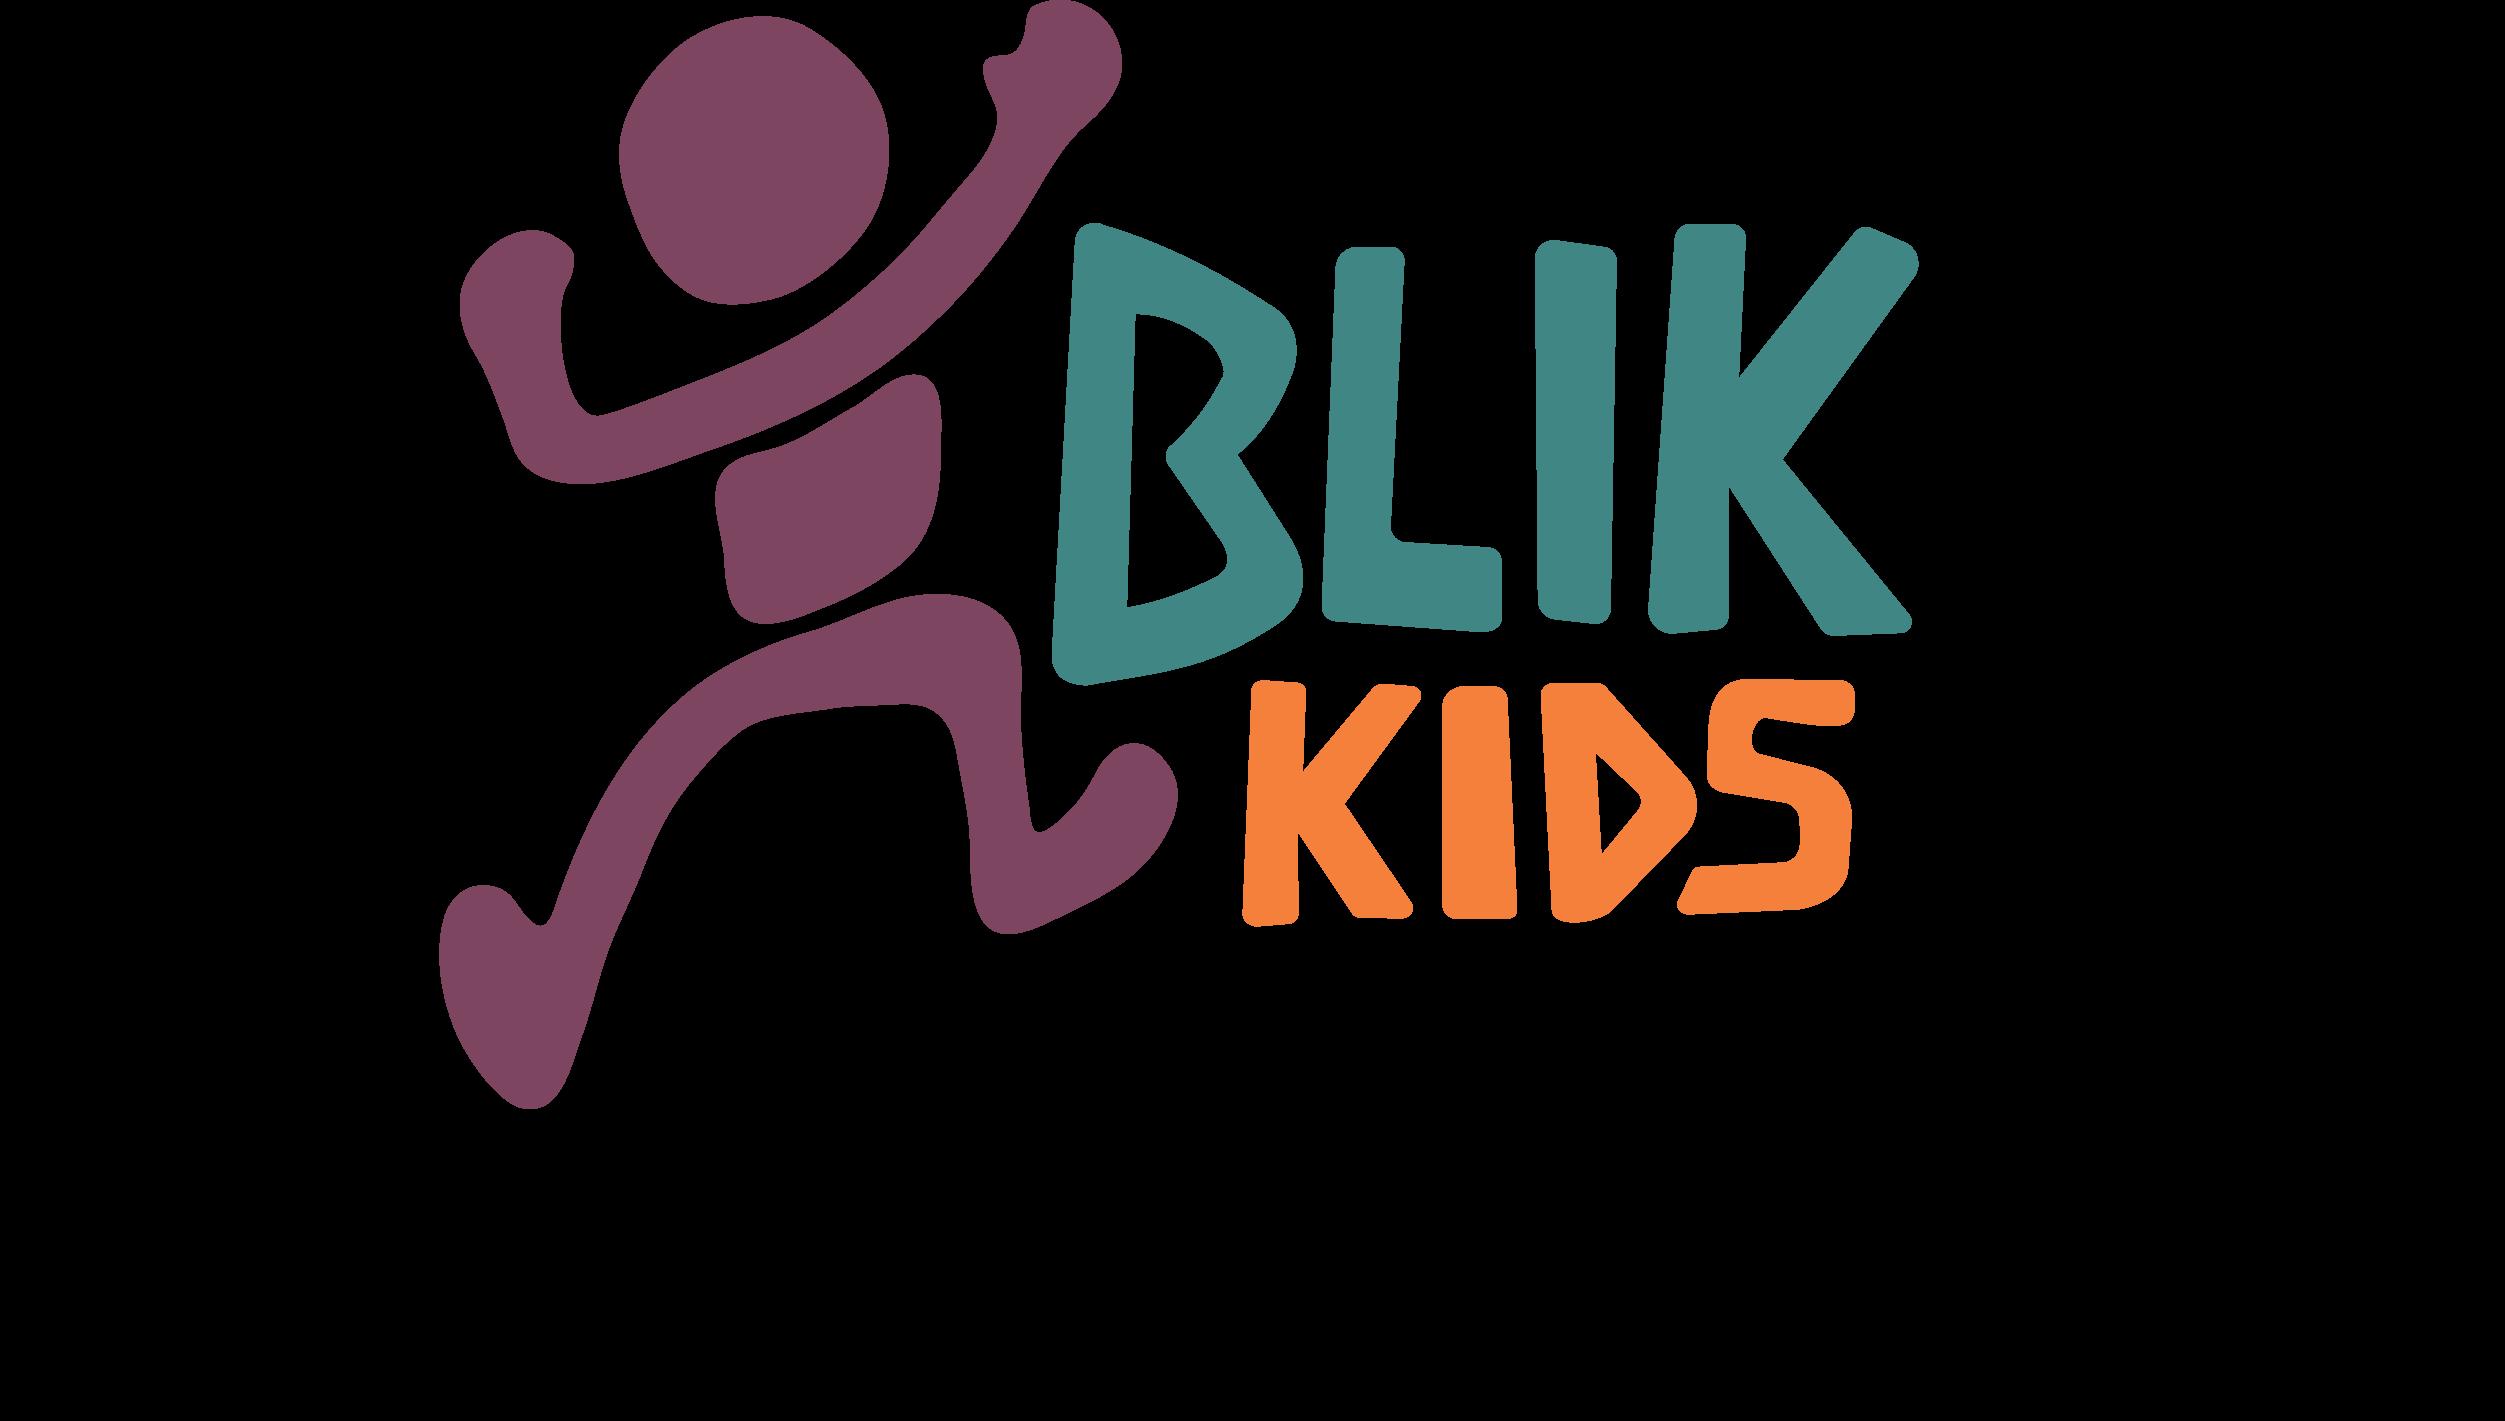 BLIK KIDS logo